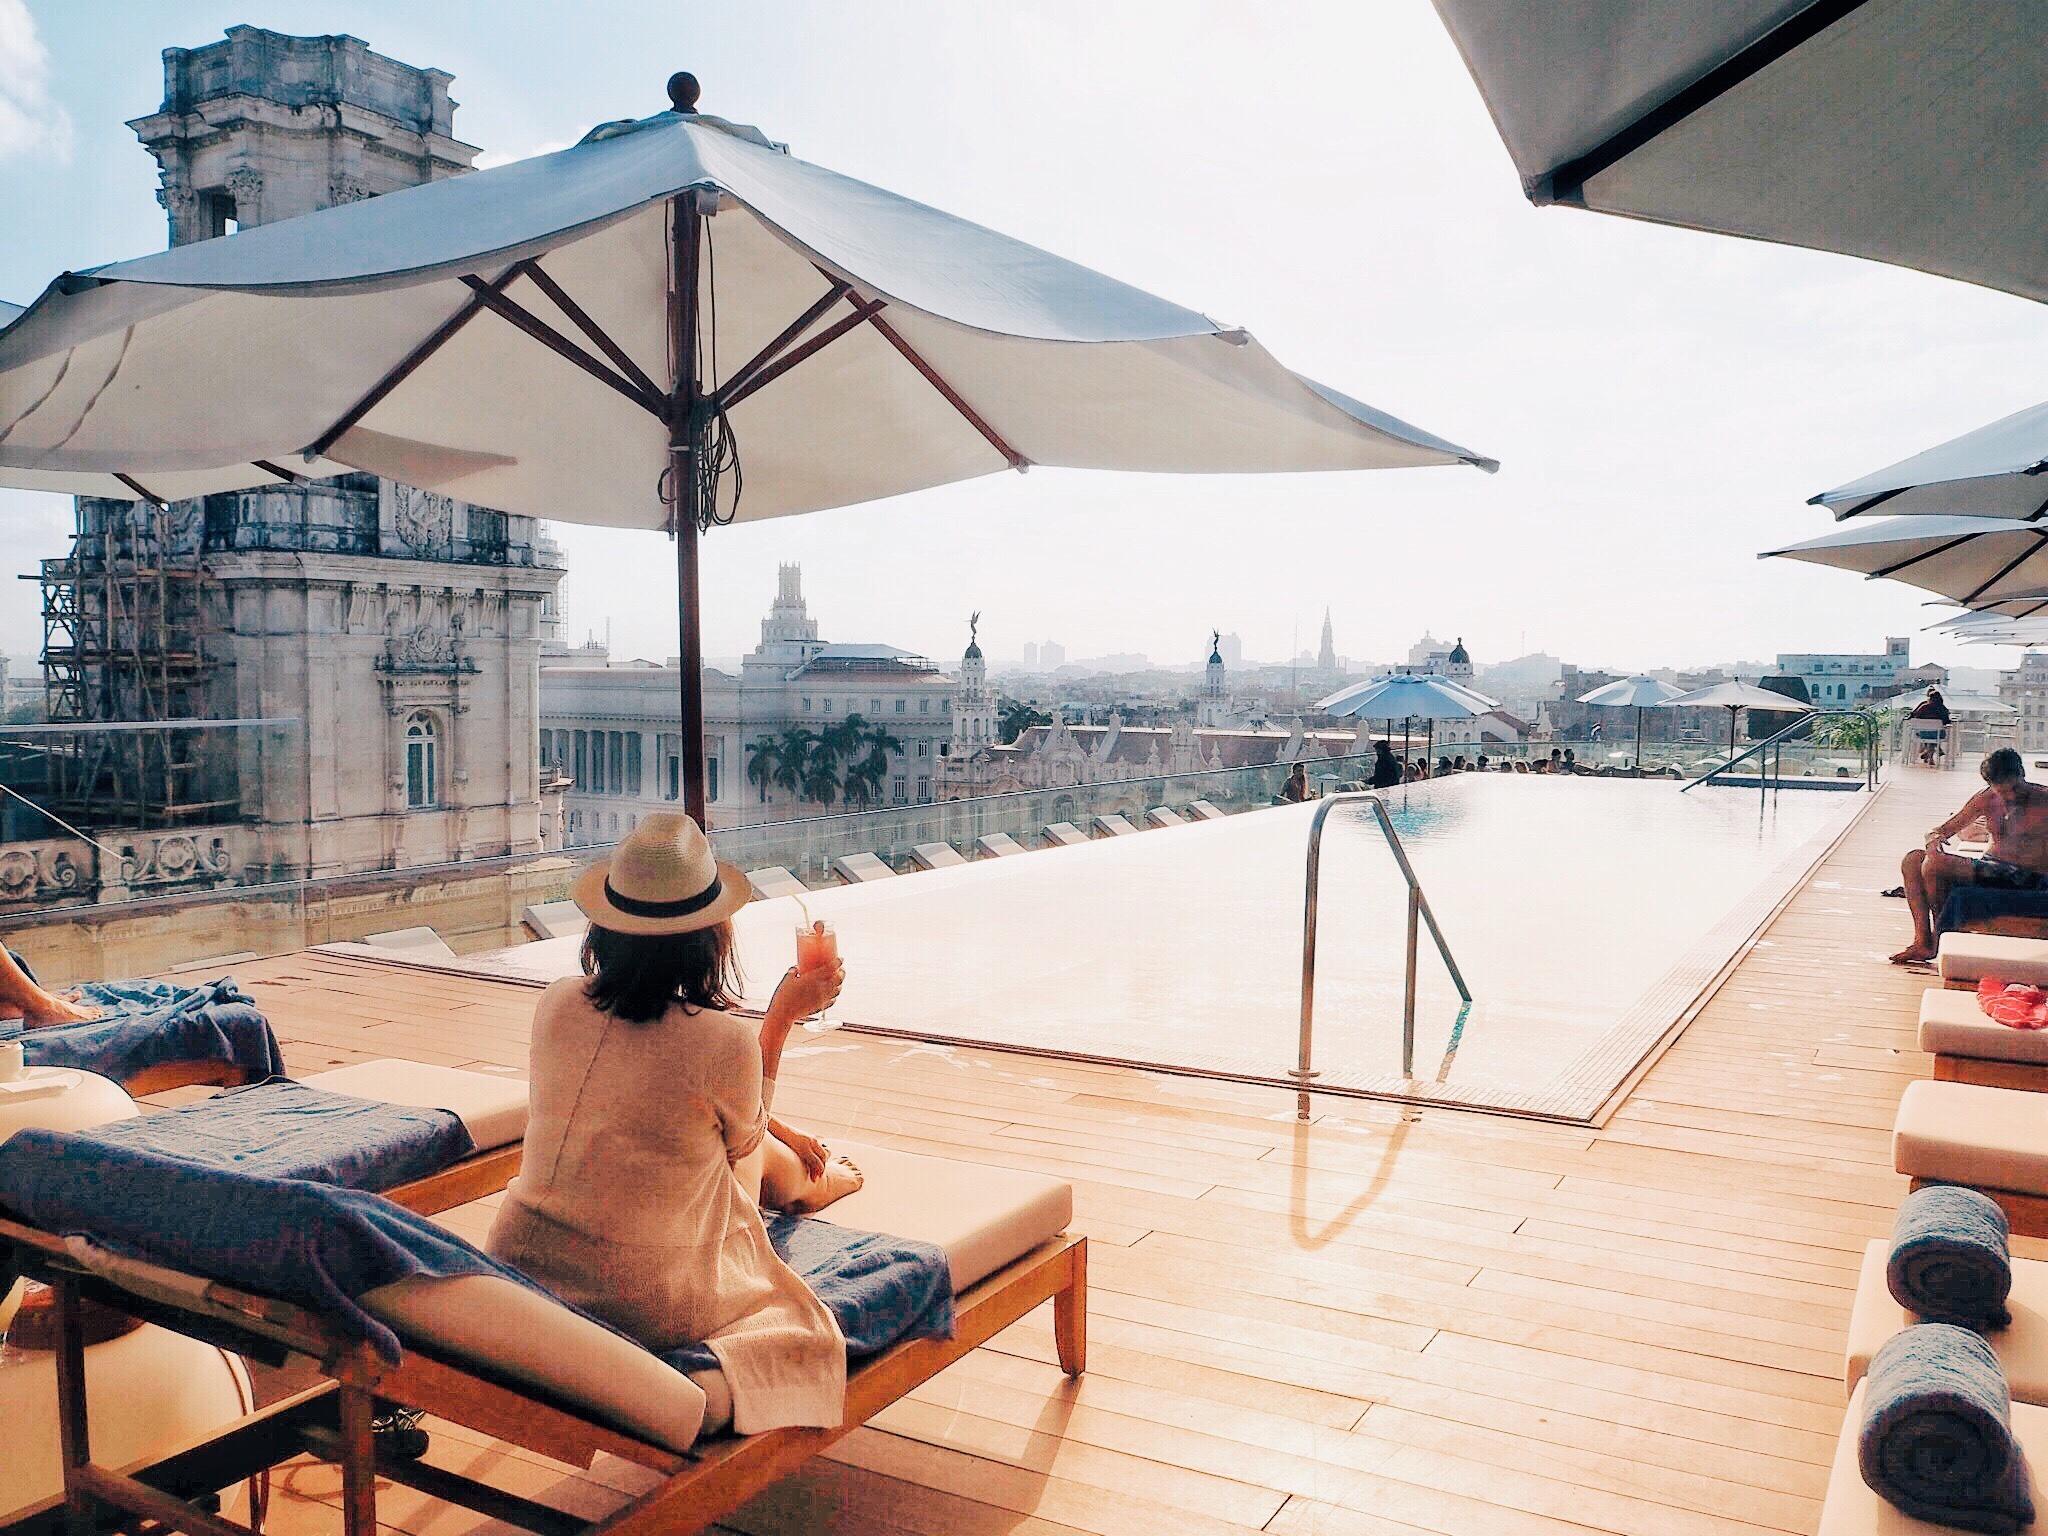 bfa902e9 a11a 4fdb 8d22 c090a9626035 - Kempinski Hotel - 2017年オープンのハバナで今1番と言われる五つ星ラグジュアリーホテル